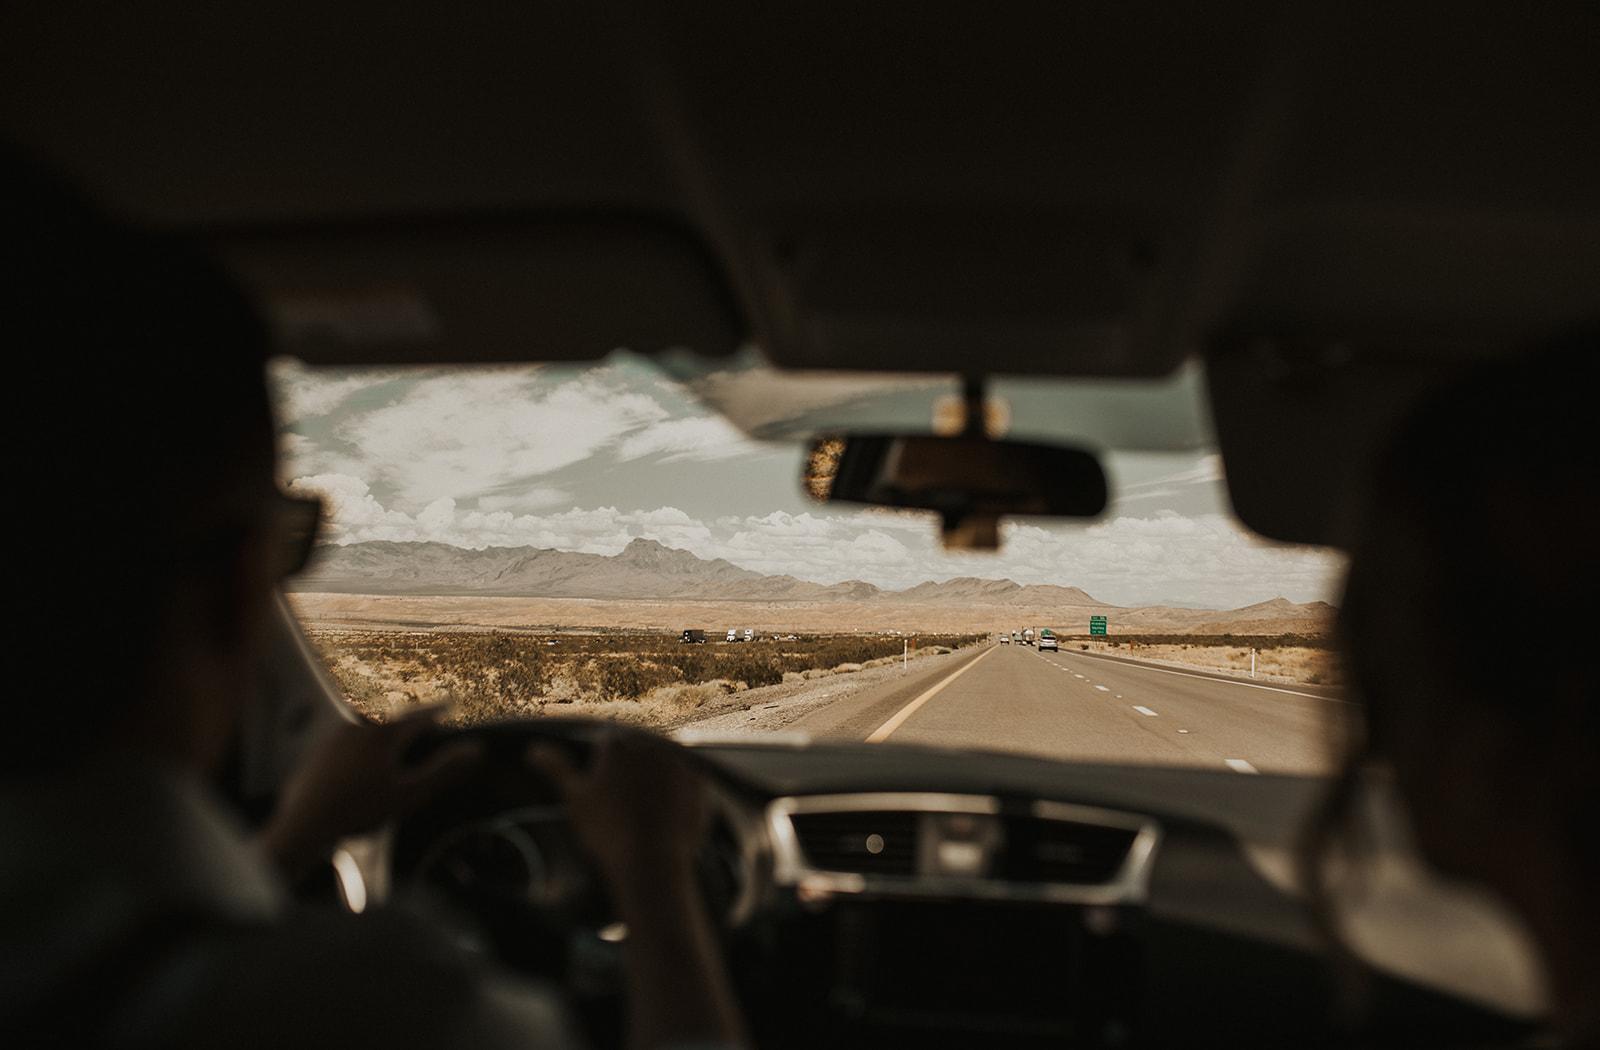 driving to desert spokane bride and groom vegas wedding